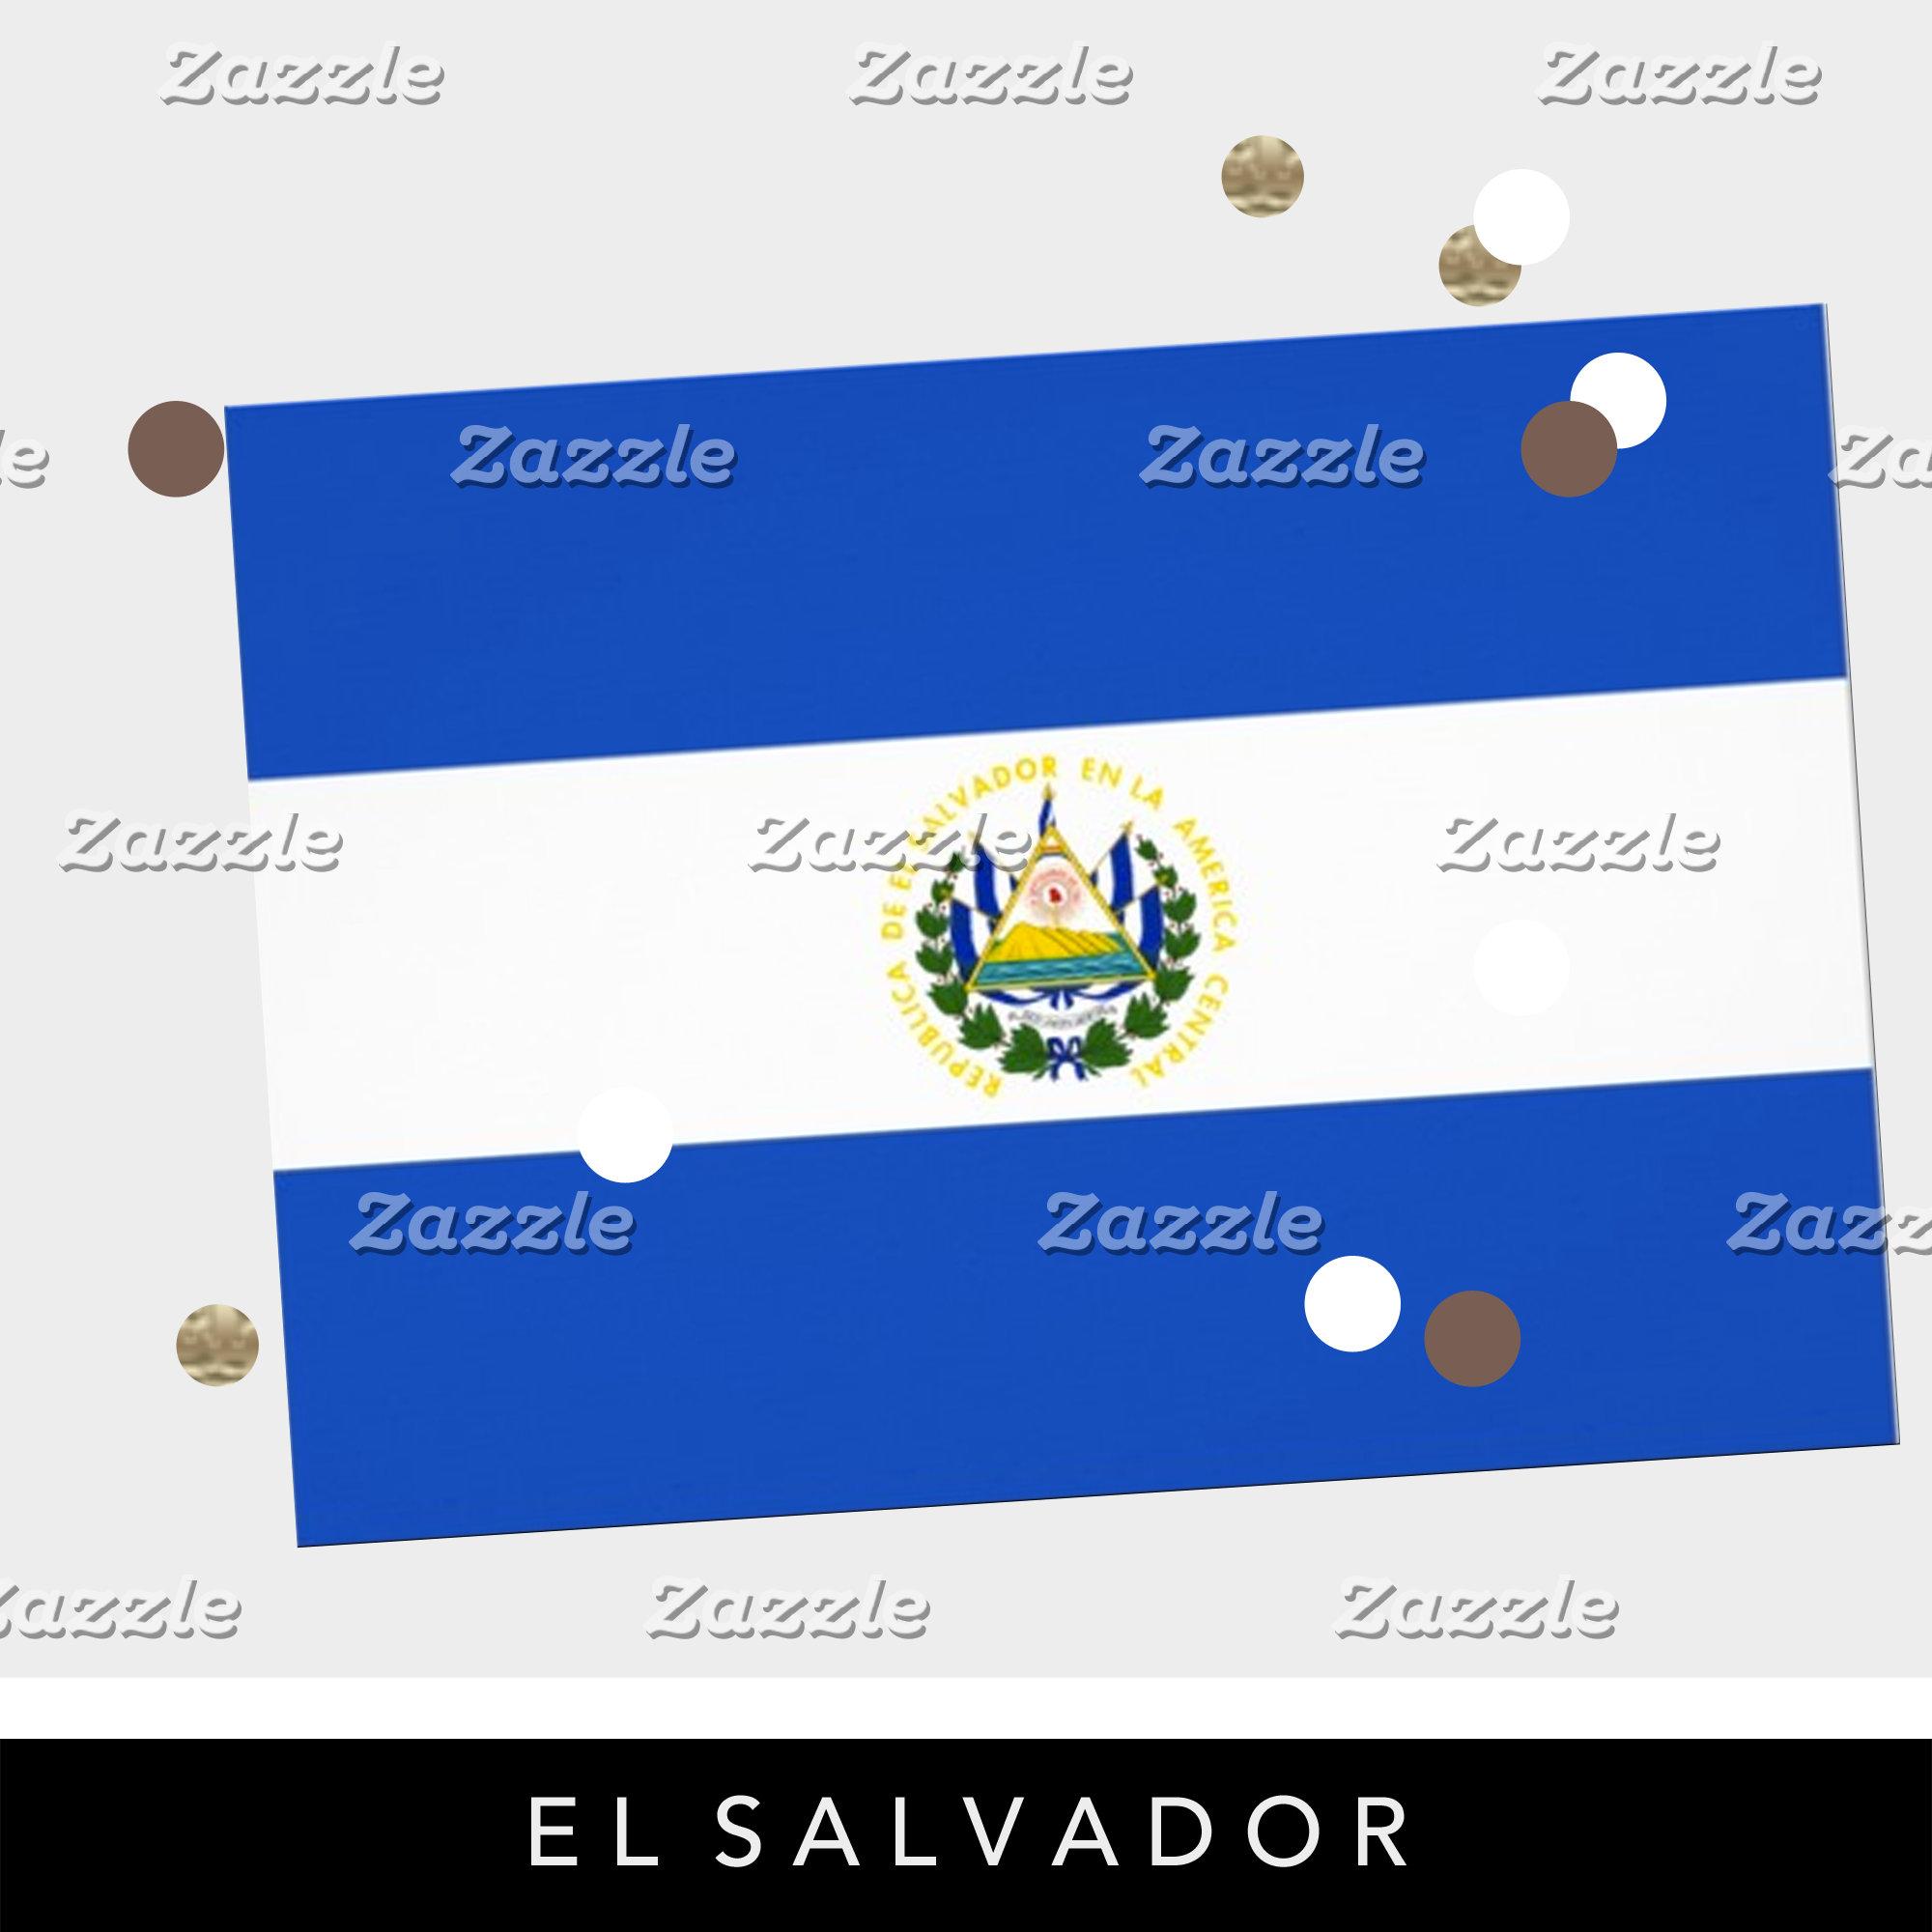 El Salvador